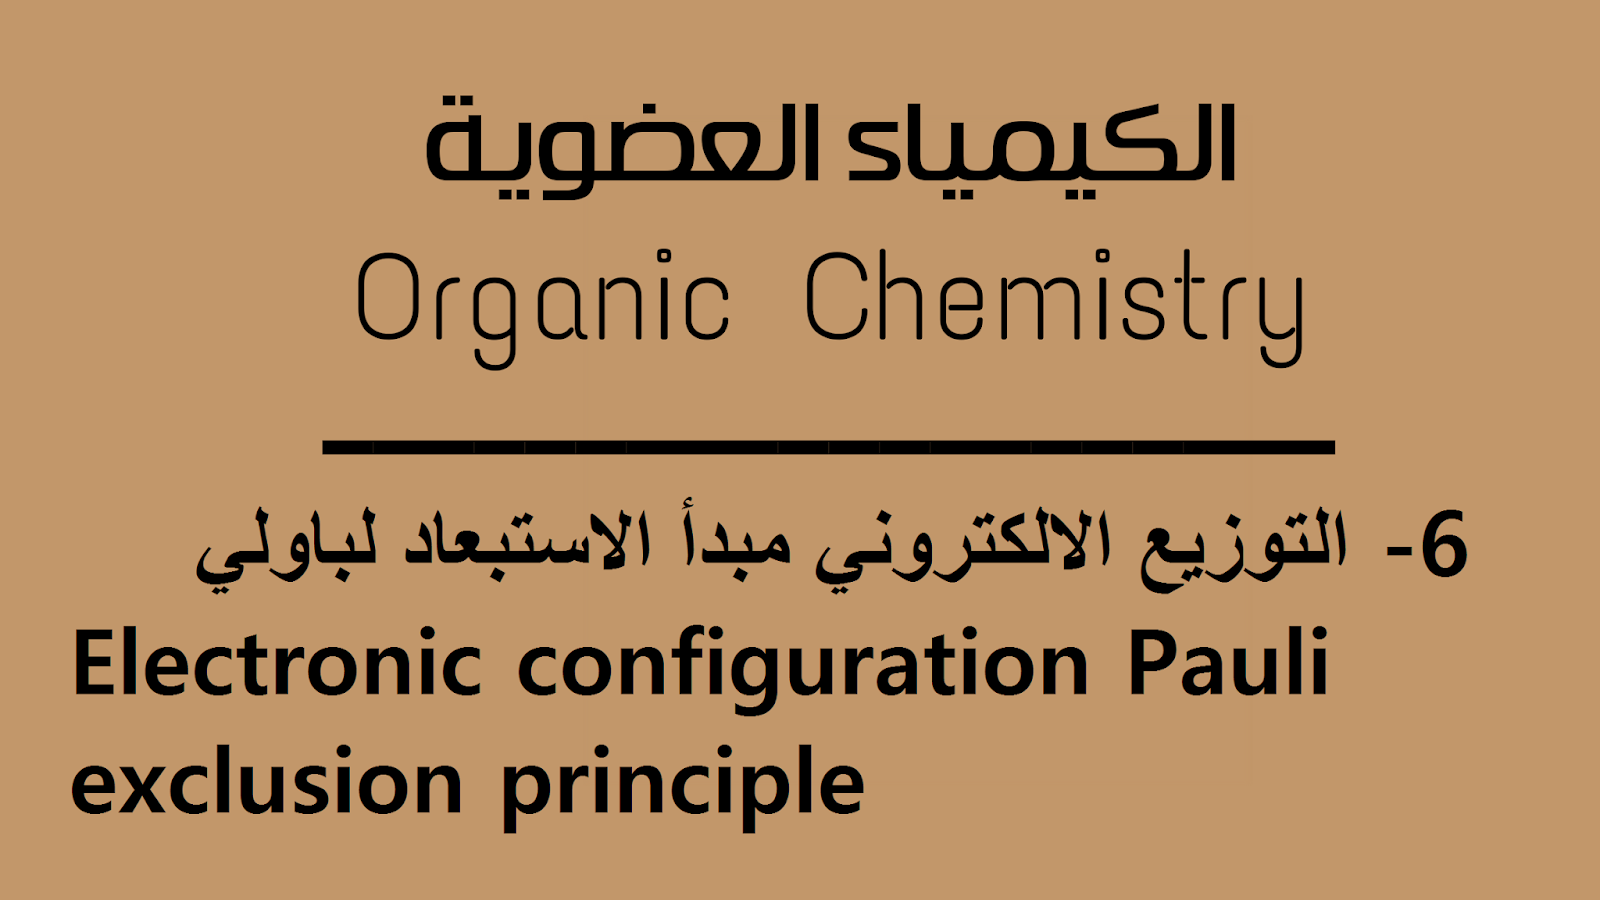 التوزيع الالكتروني مبدأ الاستبعاد لباولي Electronic Configuration Pauli Exclusion Princip Electron Configuration Organic Chemistry Pauli Exclusion Principle